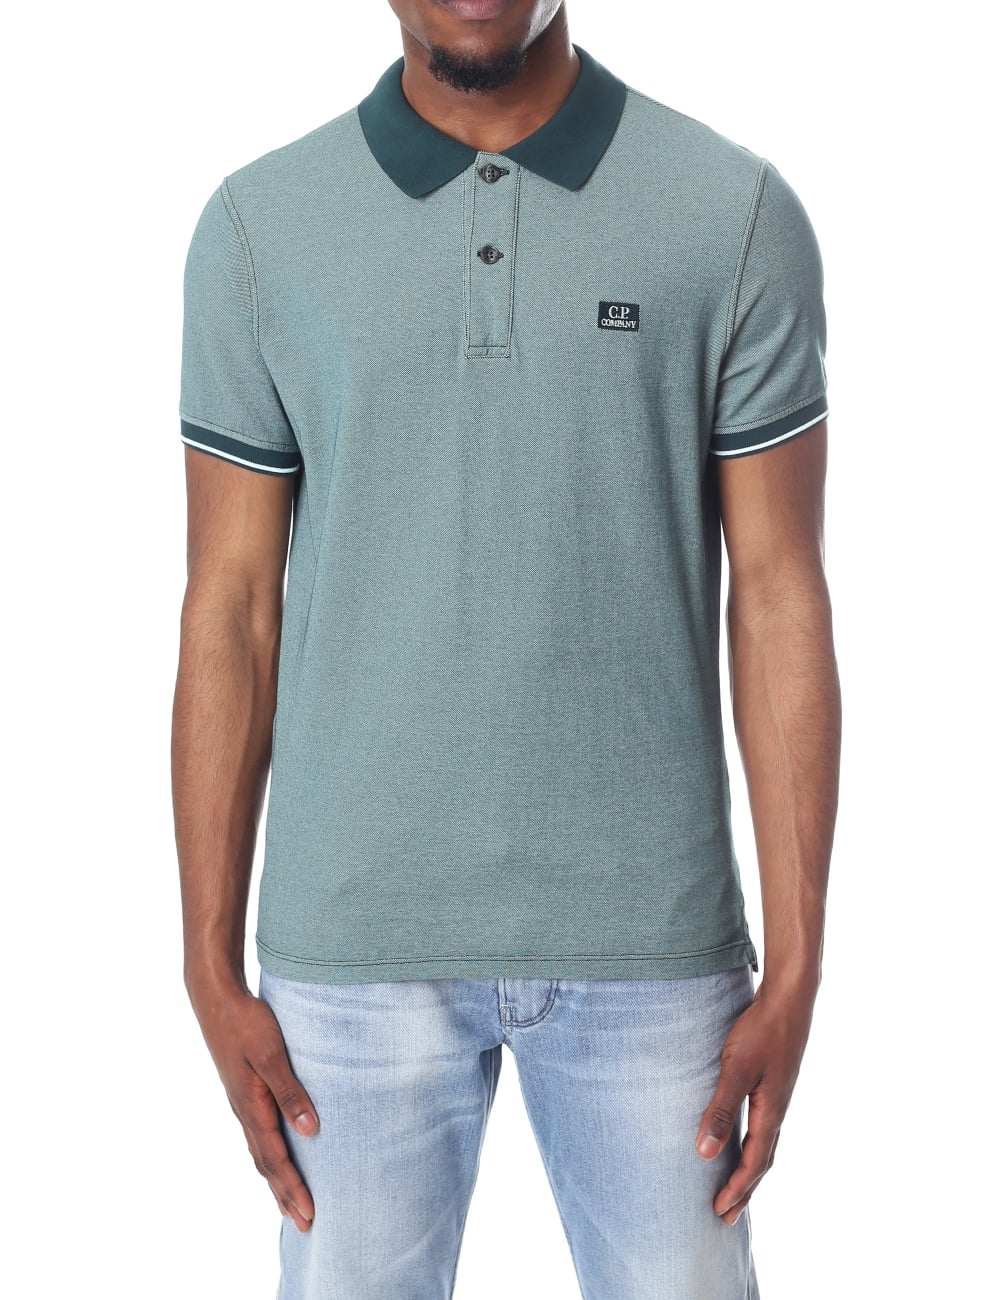 Company Polo Shirt Design Ideas | RLDM